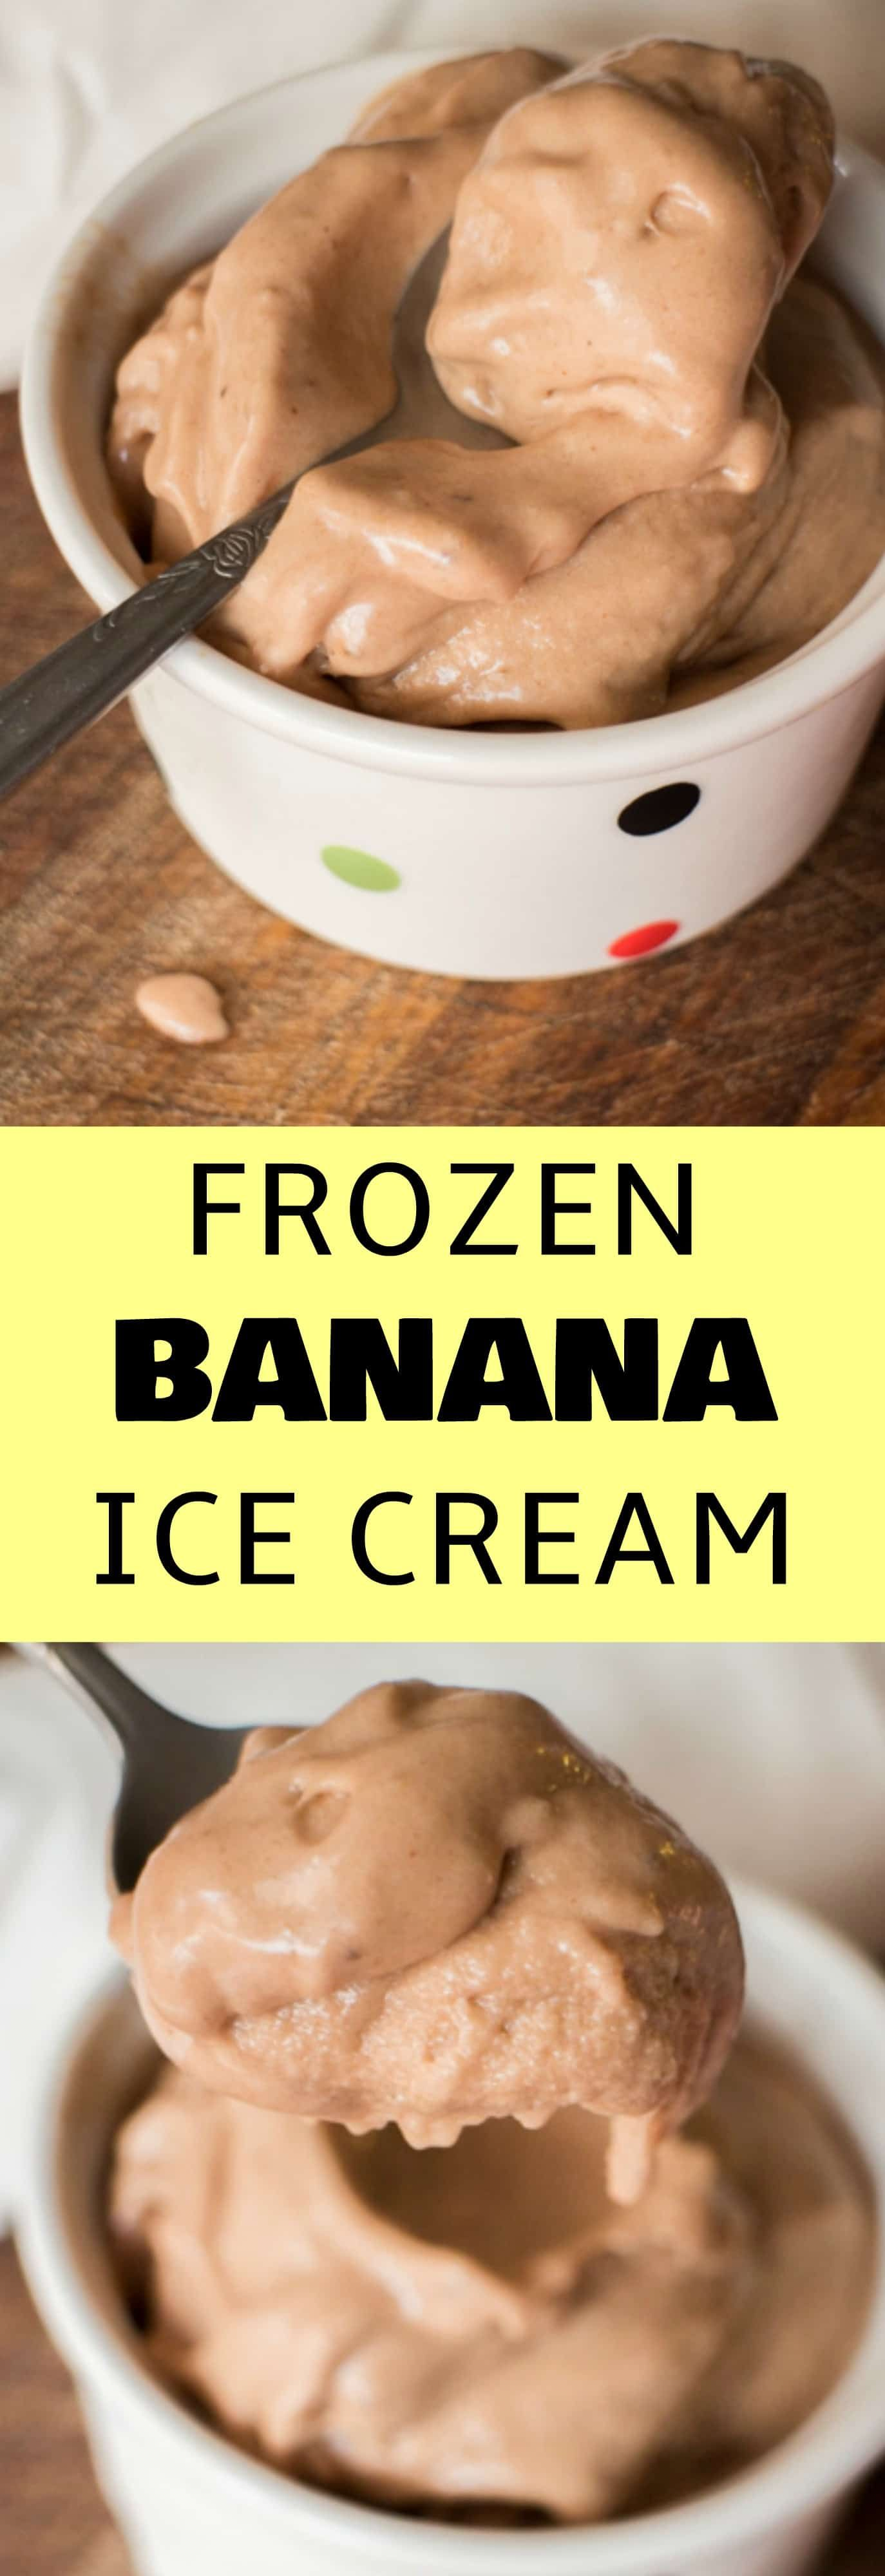 Frozen Banana Ice Cream Recipe - Healthy and easy to make!